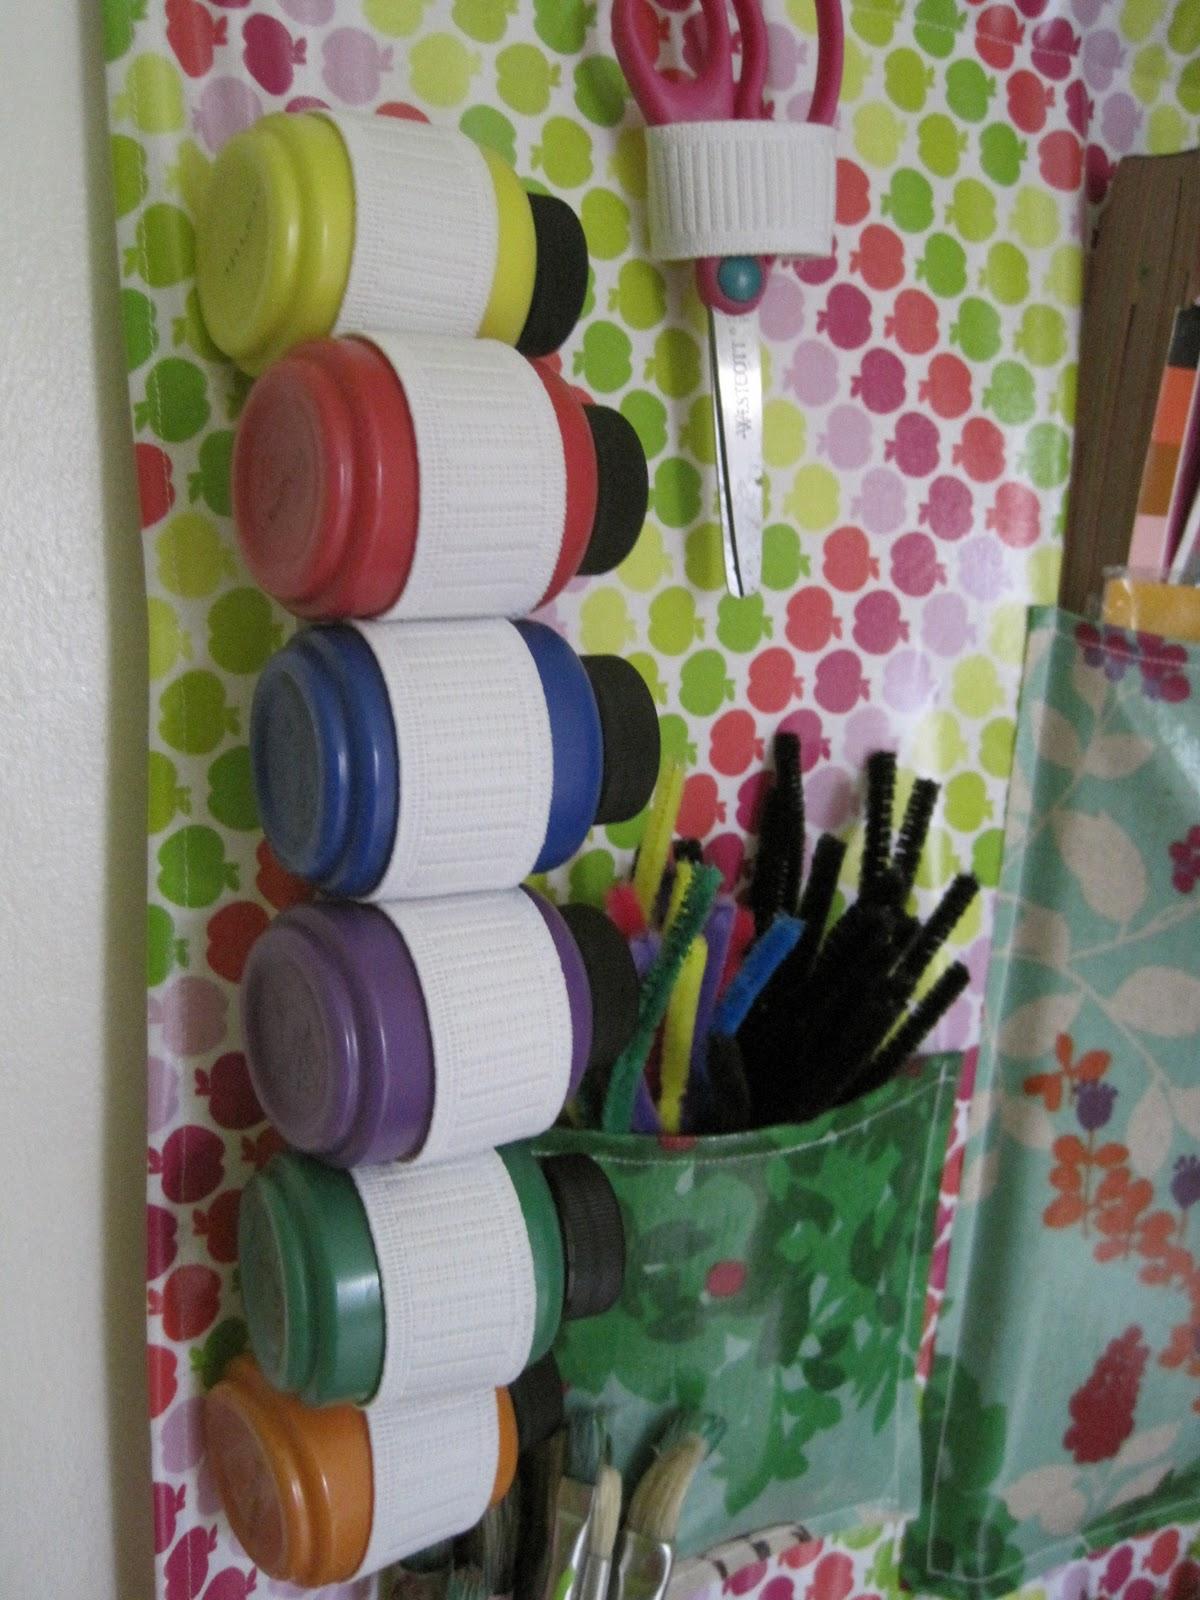 sew lux fabric blog get organized kids arts crafts. Black Bedroom Furniture Sets. Home Design Ideas